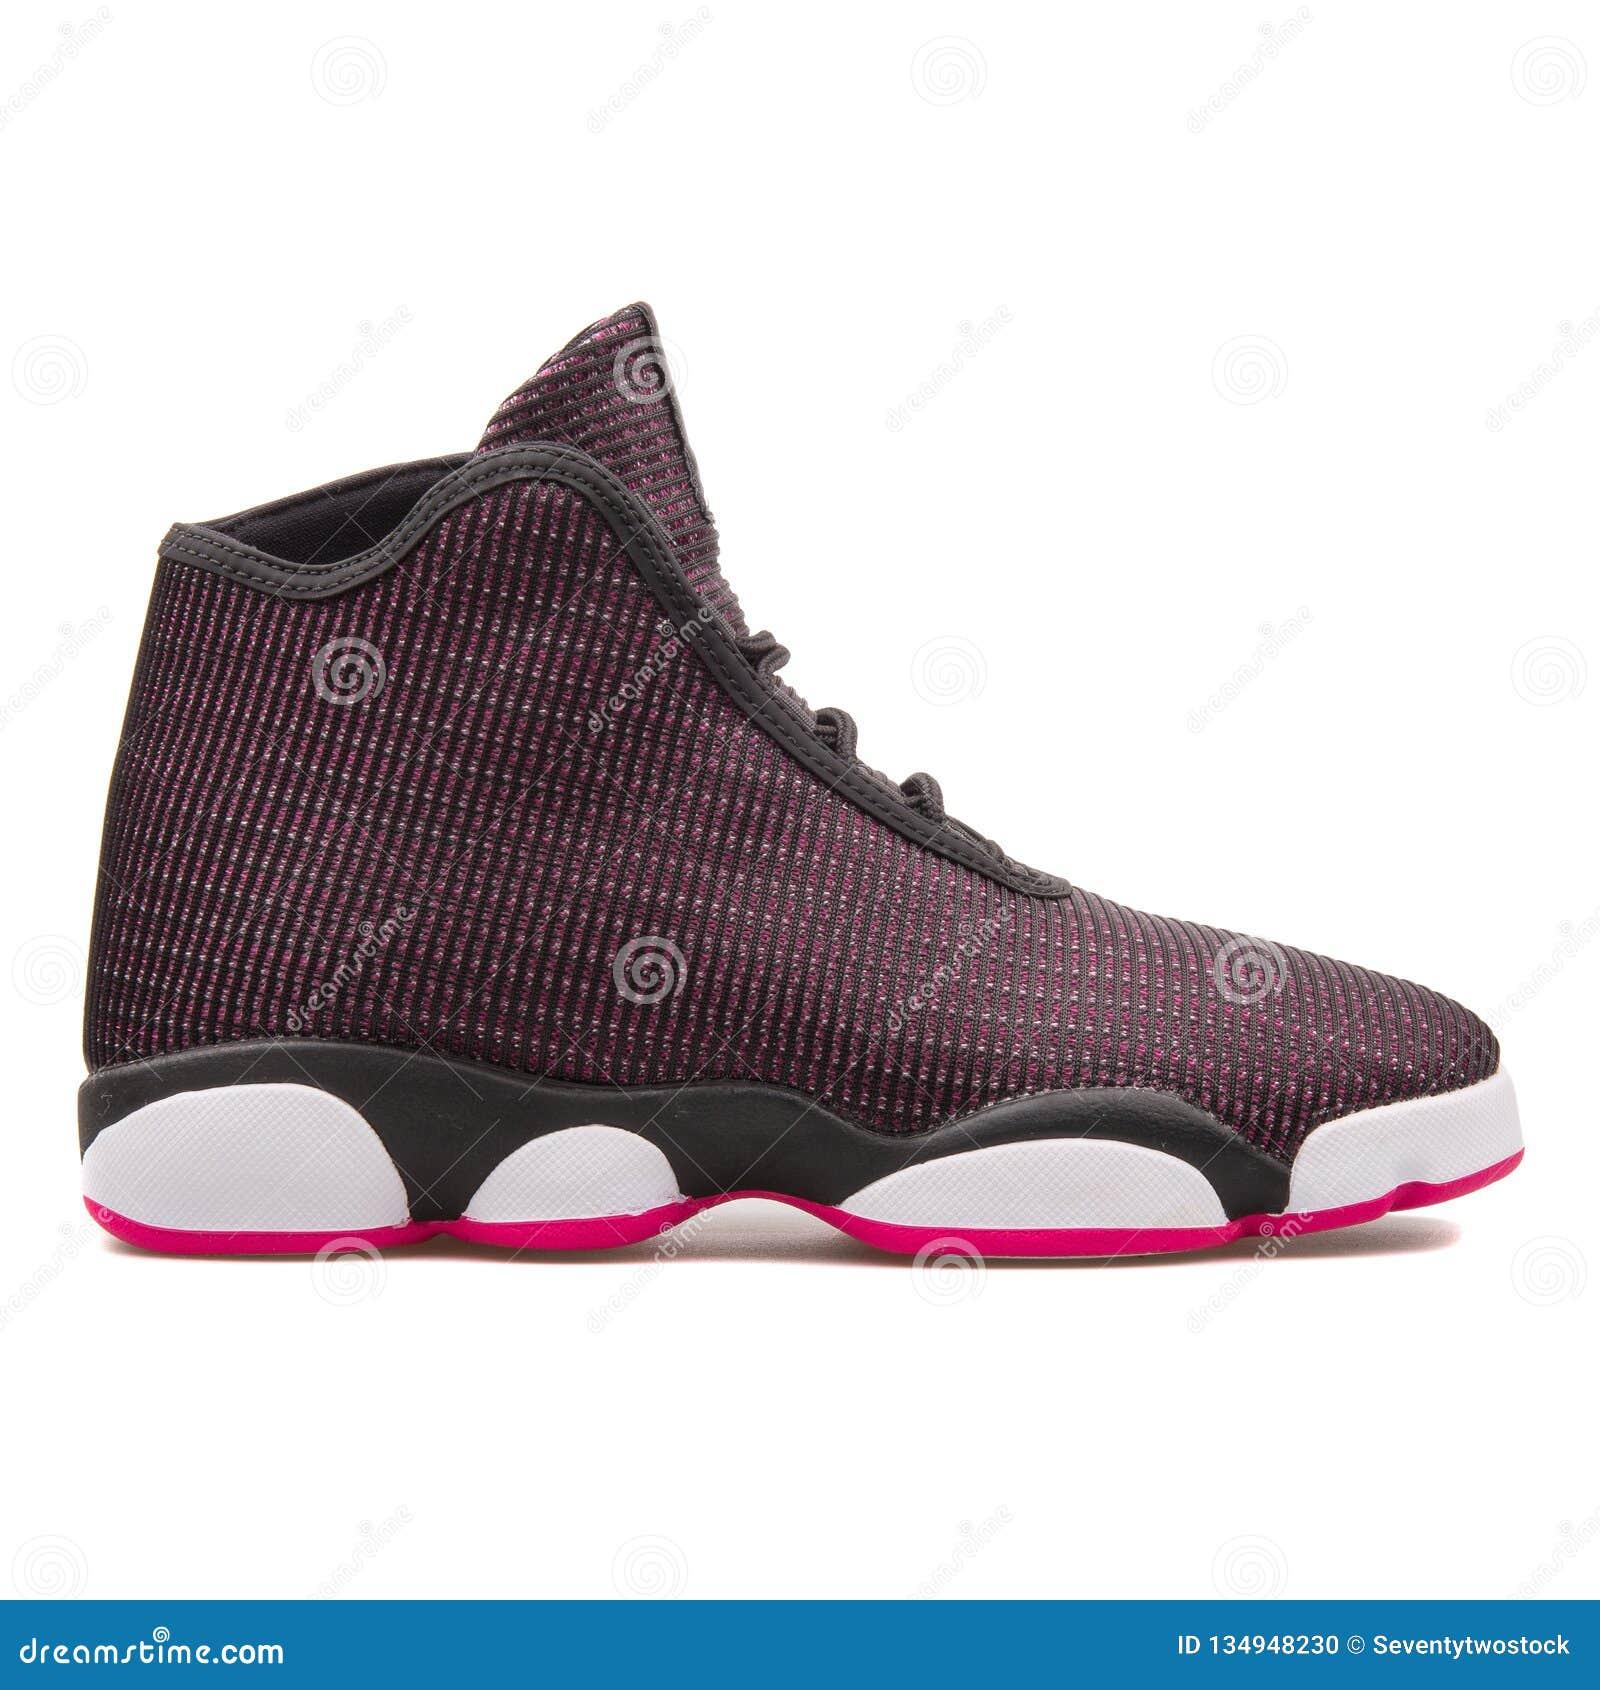 tirar a la basura Supervisar proyector  Negro Del GG De Nike Jordan Horizon Y Zapatilla De Deporte Púrpura Imagen  editorial - Imagen de jordan, nike: 134948230